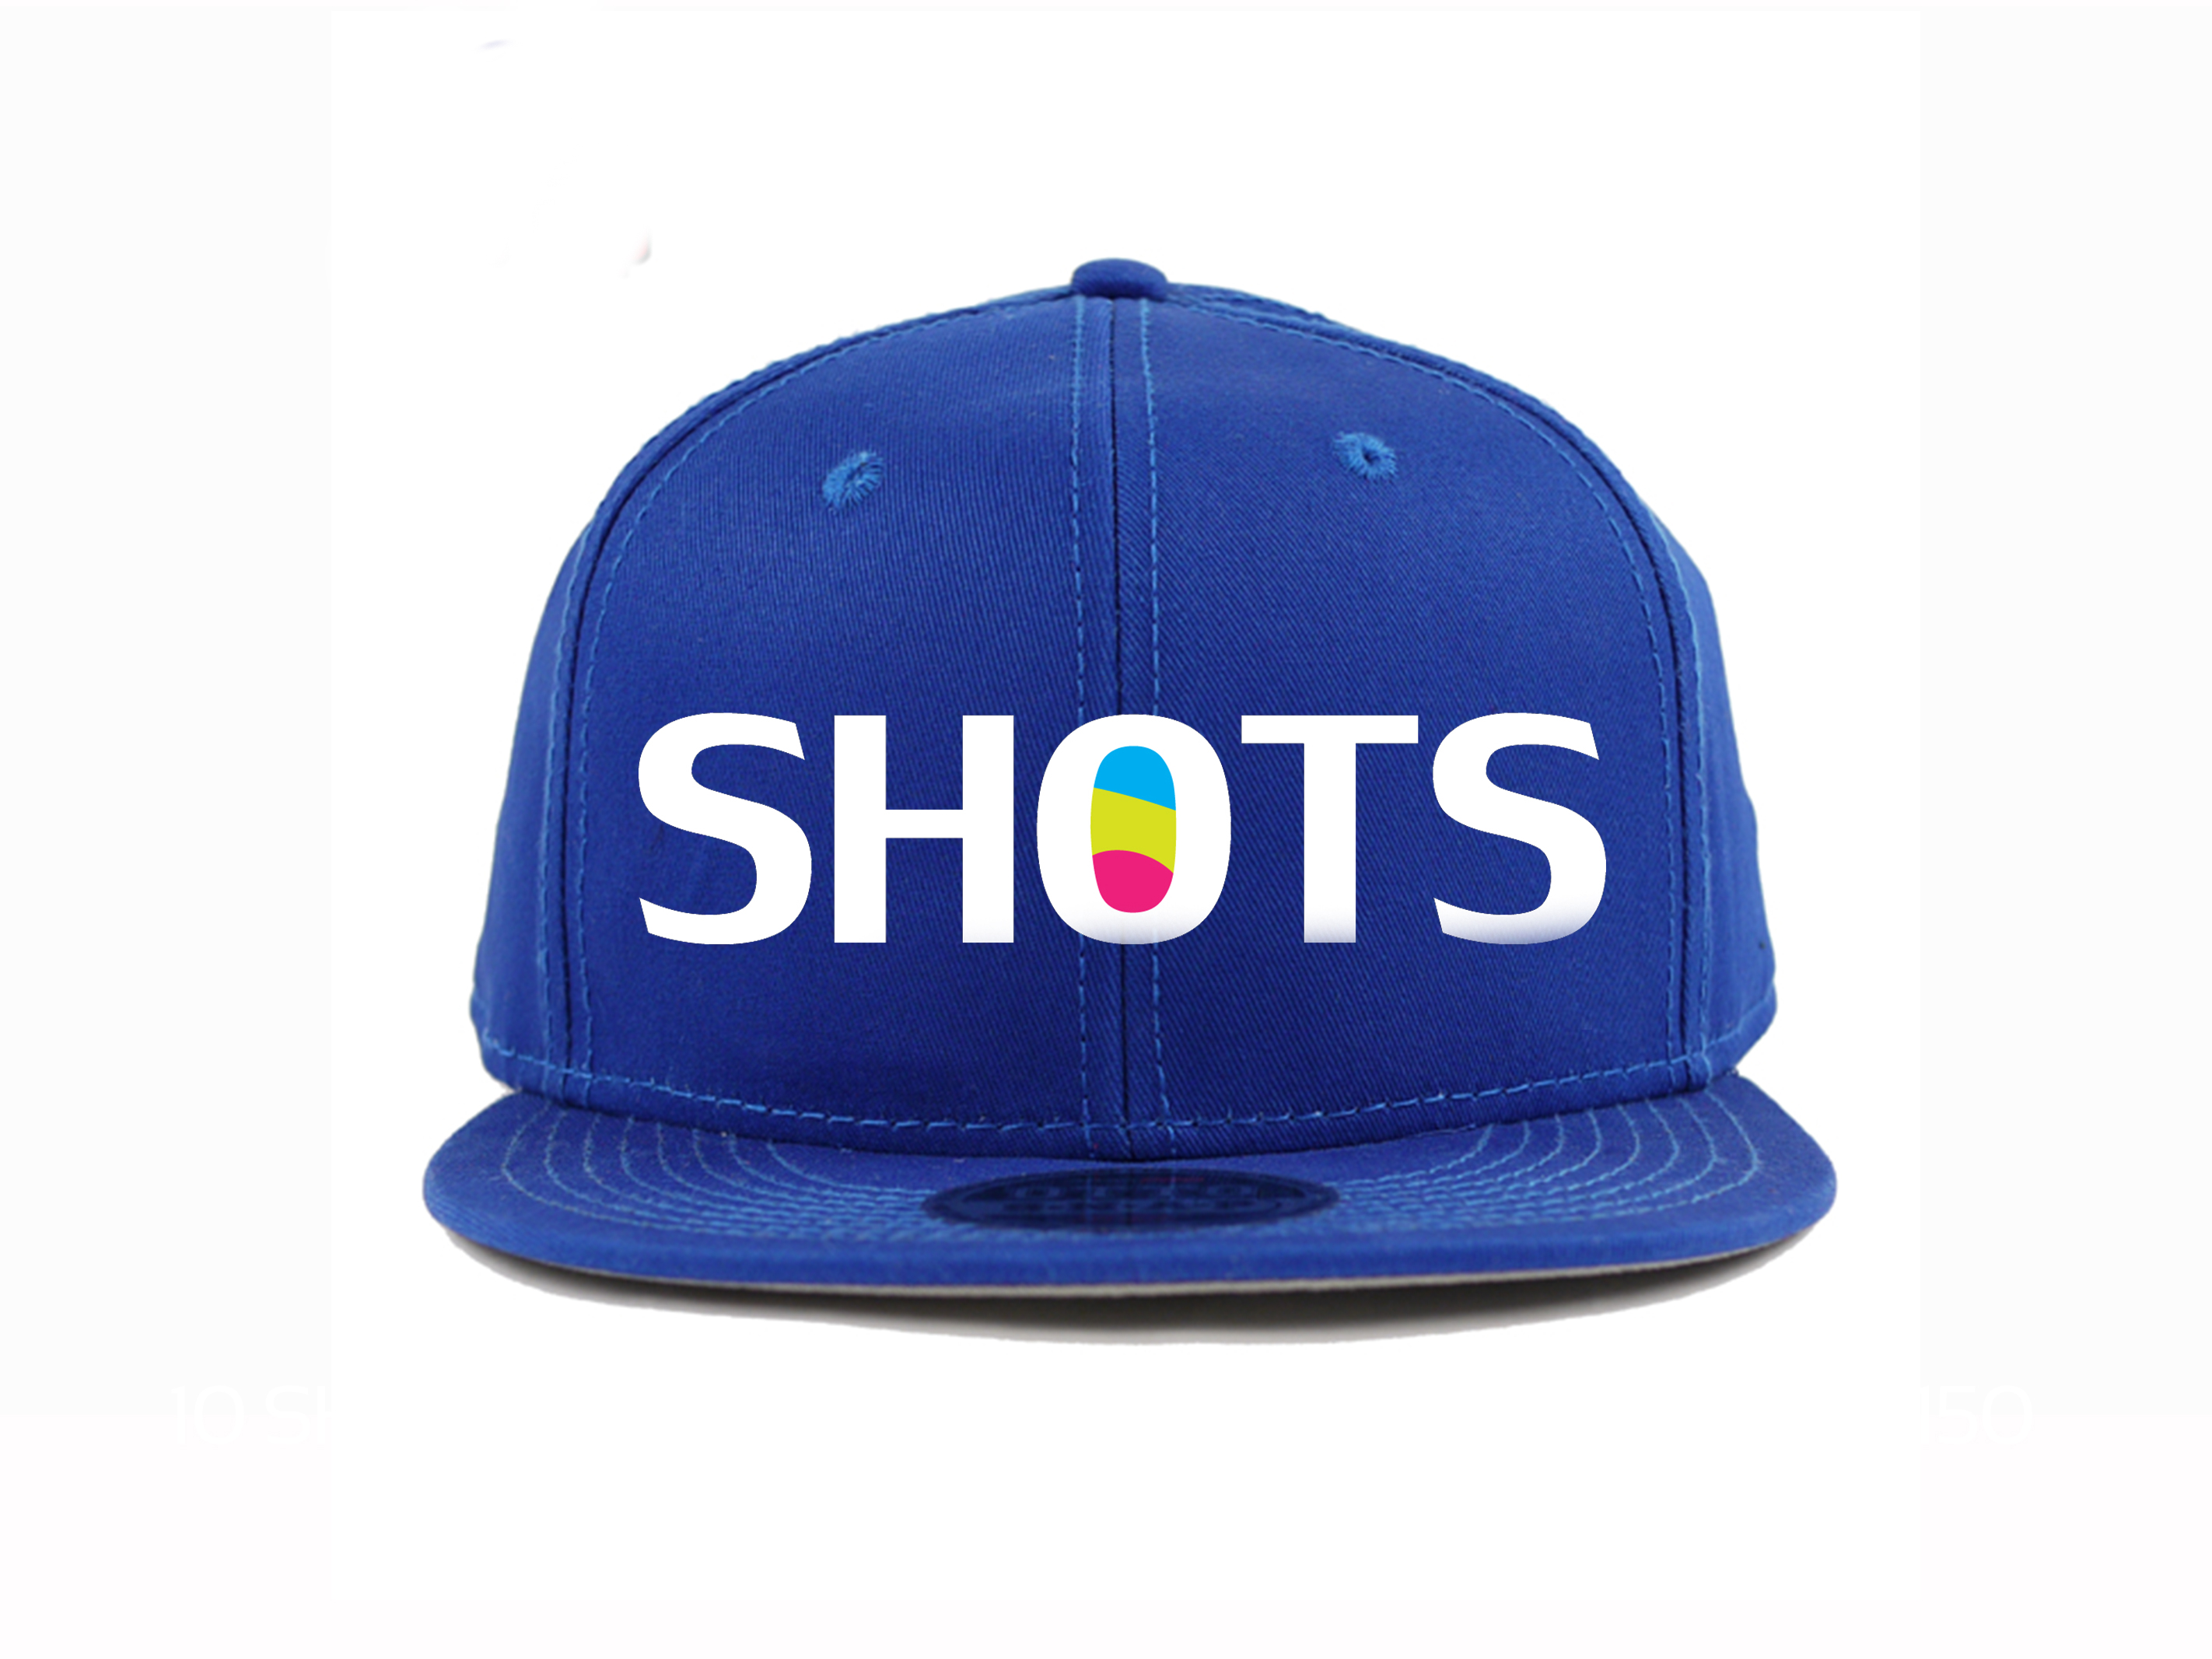 Blue SHOTS Snapback